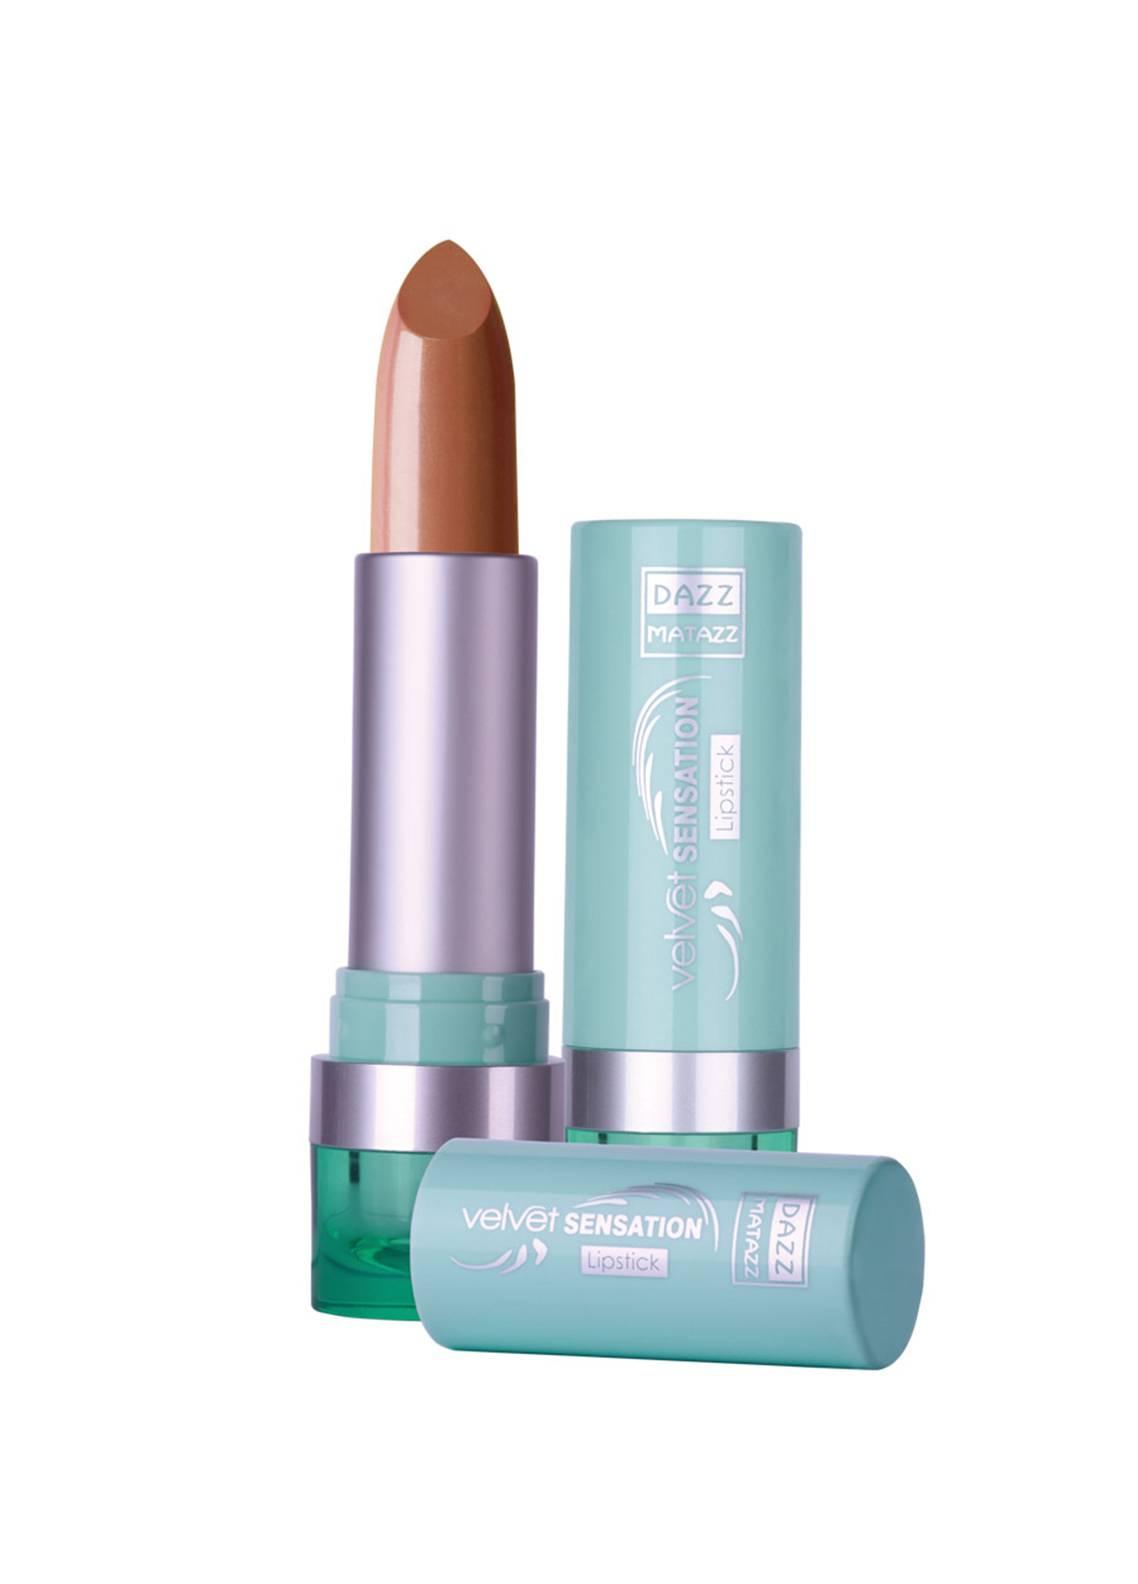 Dazz Matazz Velvet Sensation Lipstick-28 ICED MOCHA LATTE